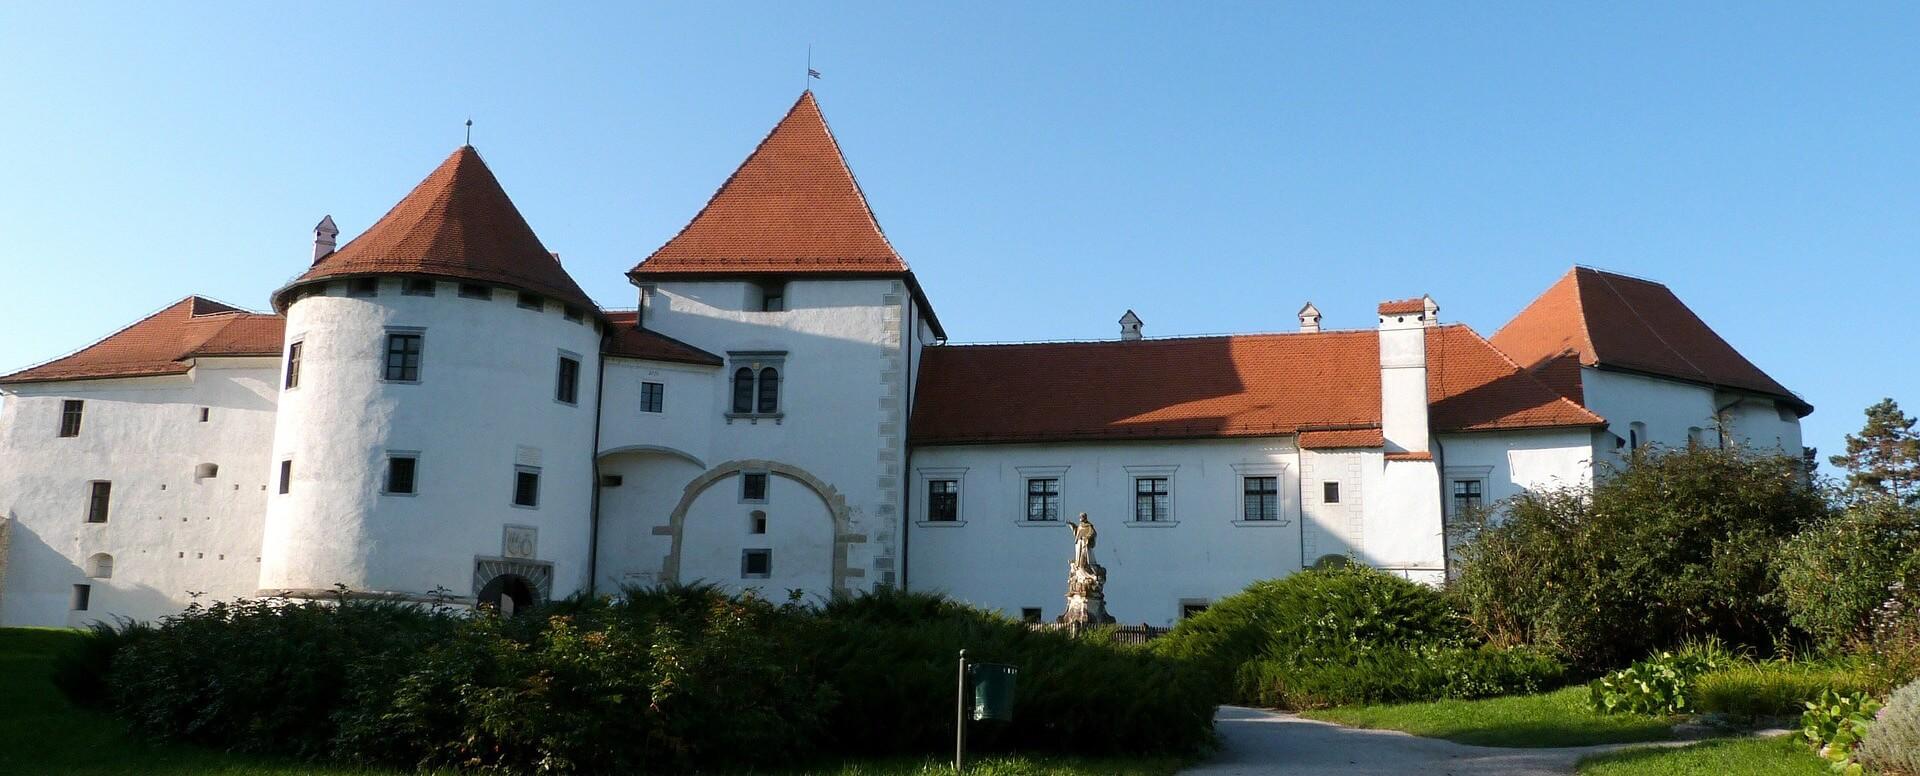 8. Profiter des événements culturels de Varaždin - Croatie